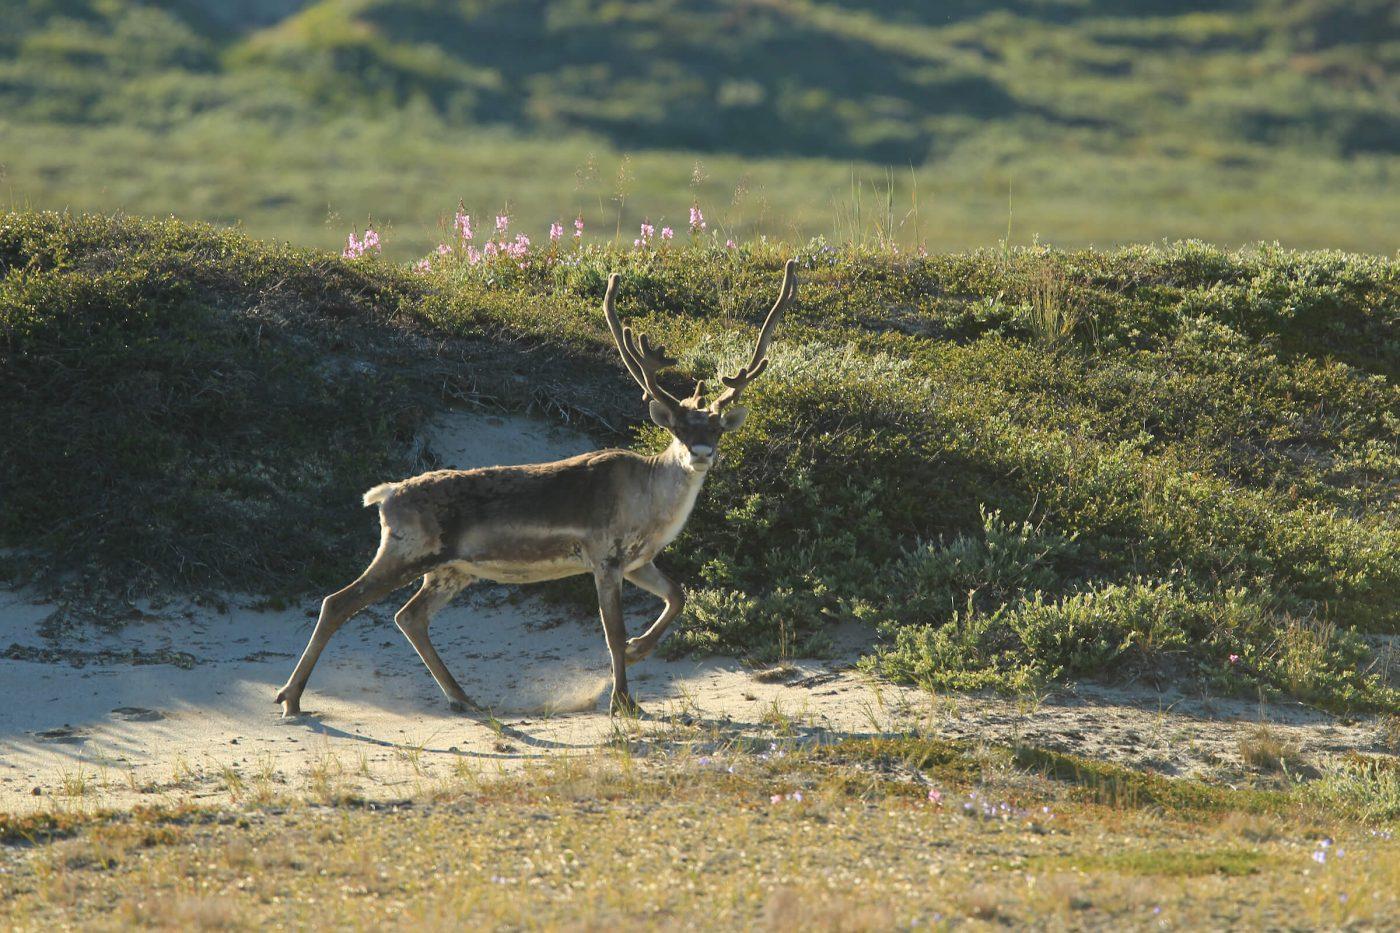 Reindeer on the beach in summer, by Klaus Eskildsen